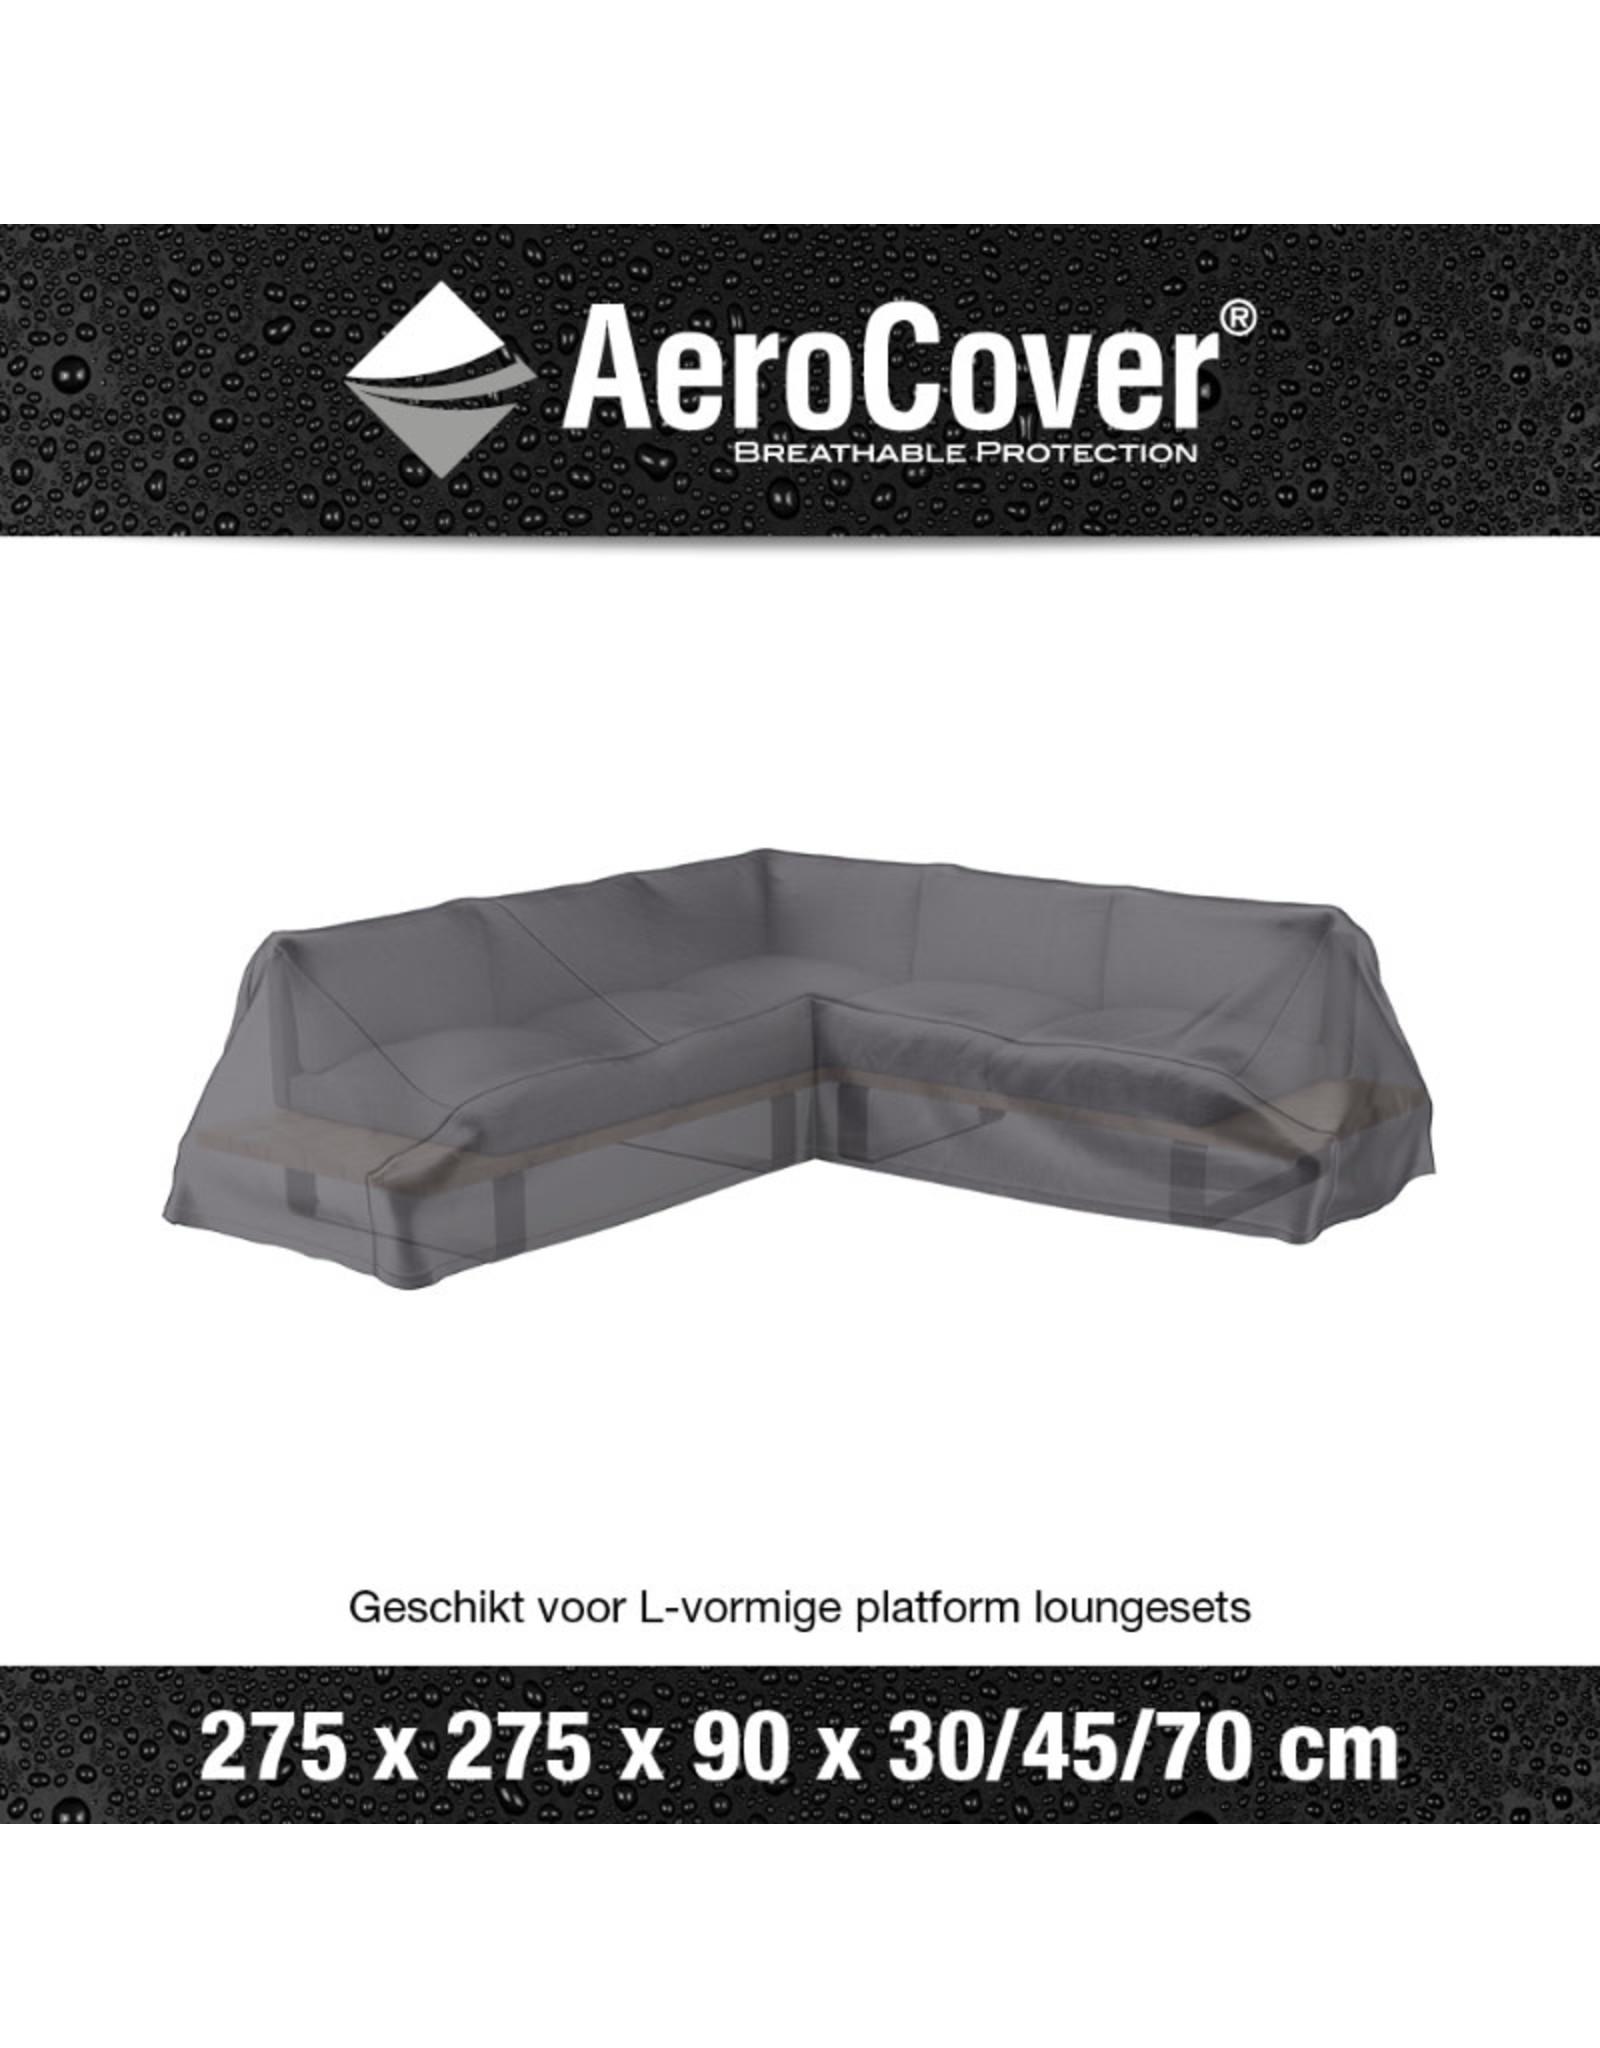 Aerocover AeroCover Loungeset platformhoes 275x275x90xH30-45-70